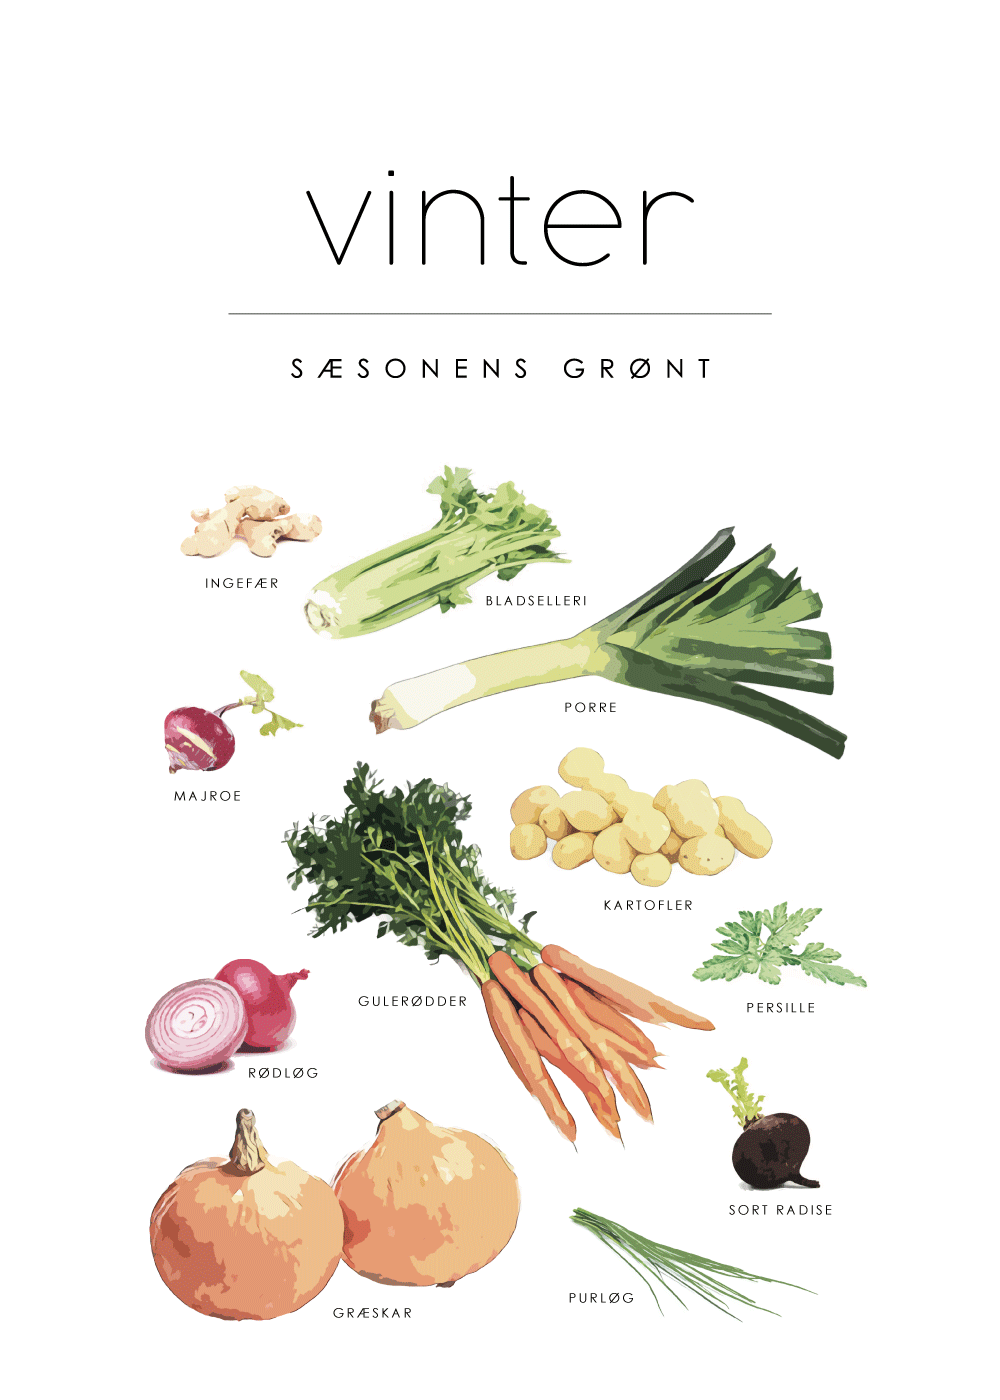 Vinter - Sæsonens grøntsager plakat